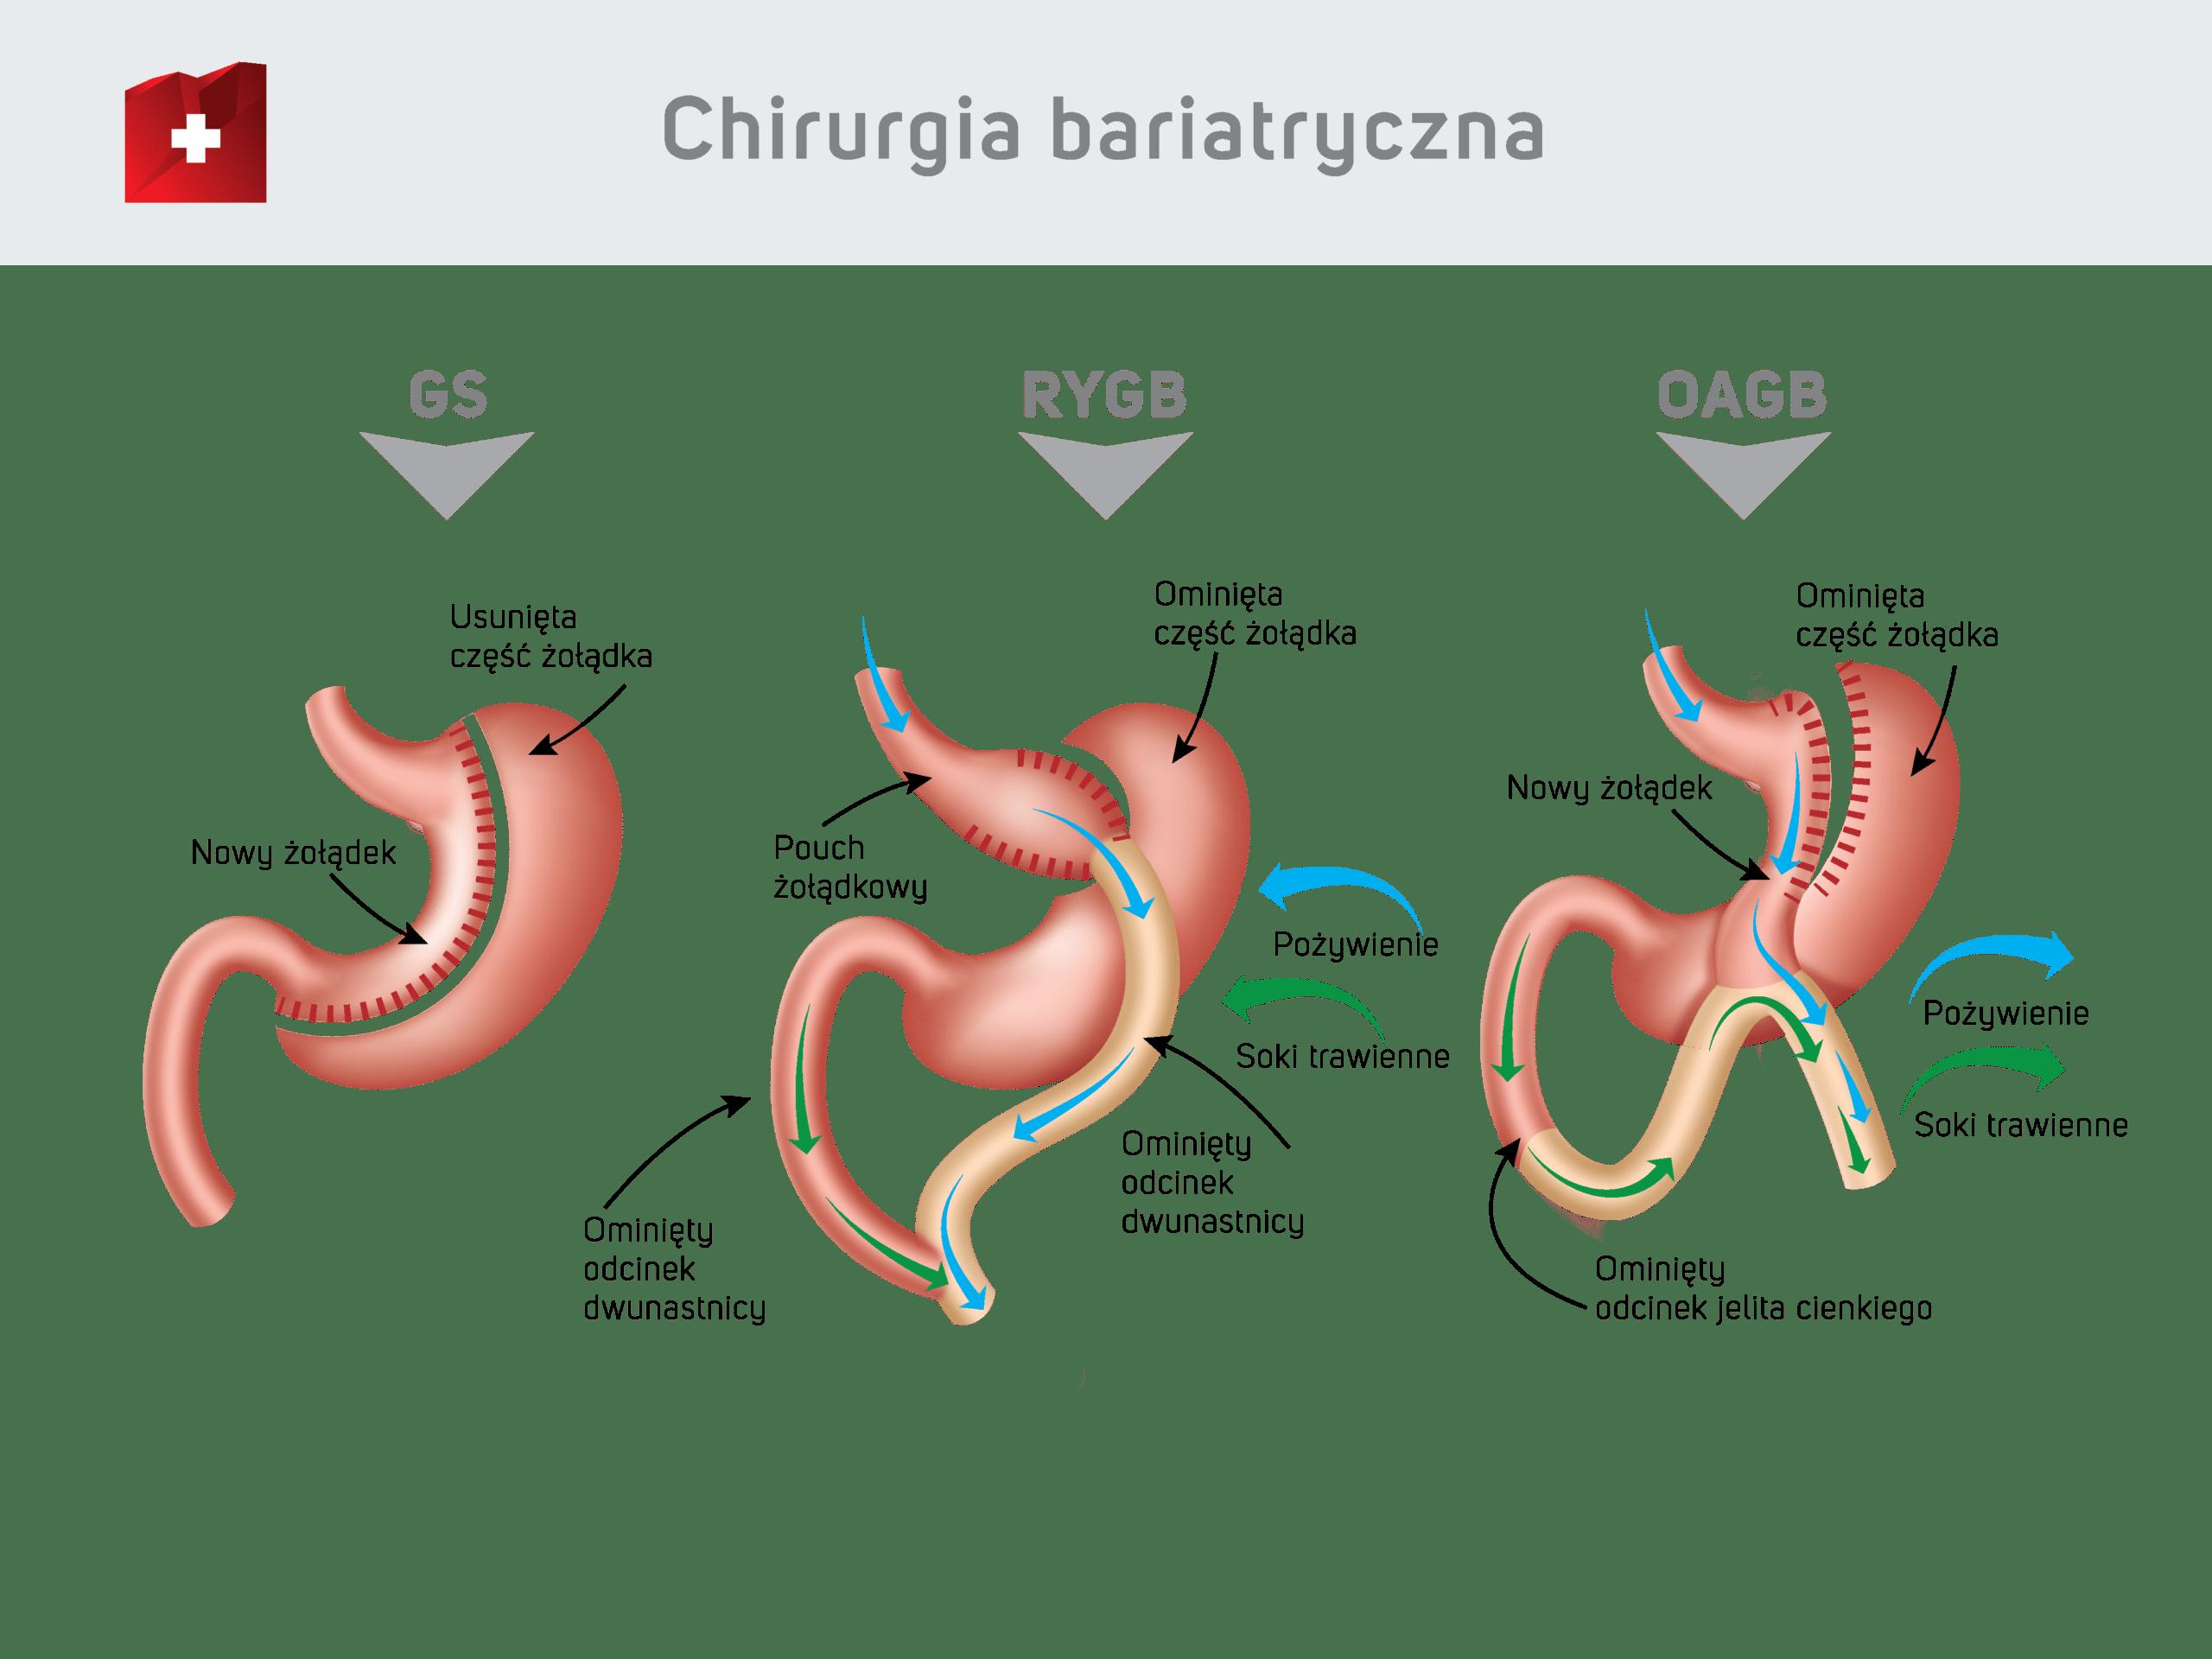 Chrirurgia bariatryczna - zabiegi GS / RYGB / OAGB